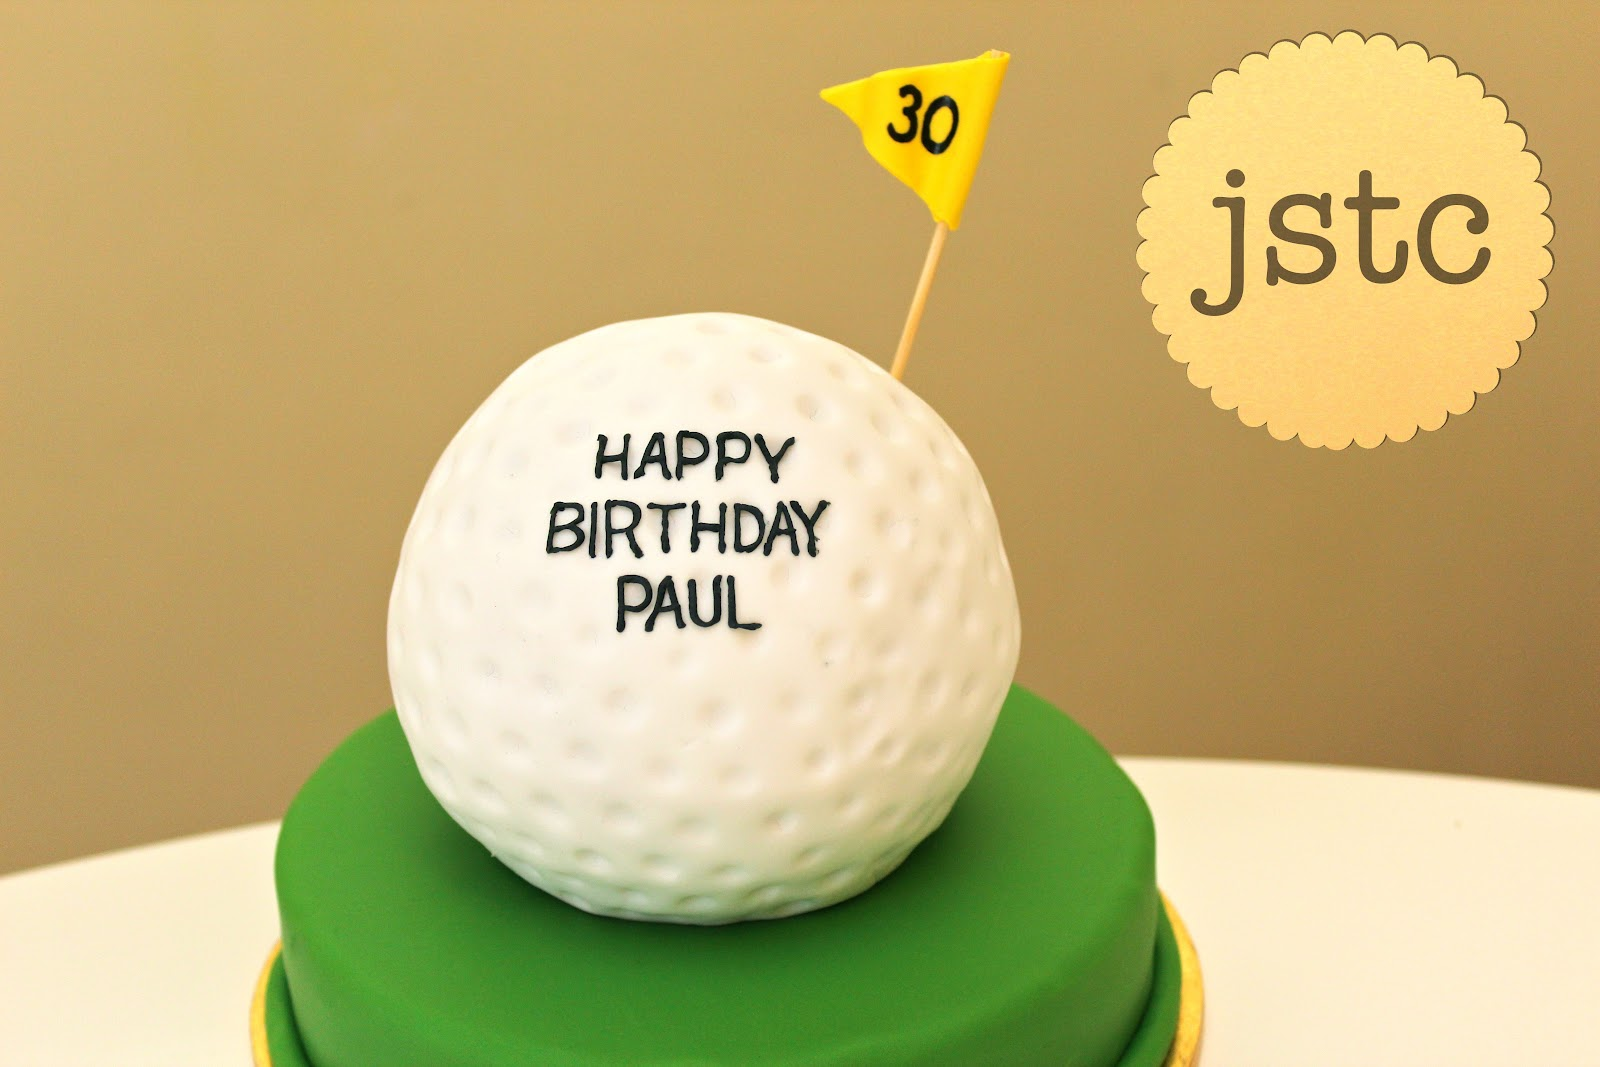 Jemmas Sweet Treat Catering Golf Ball Cake